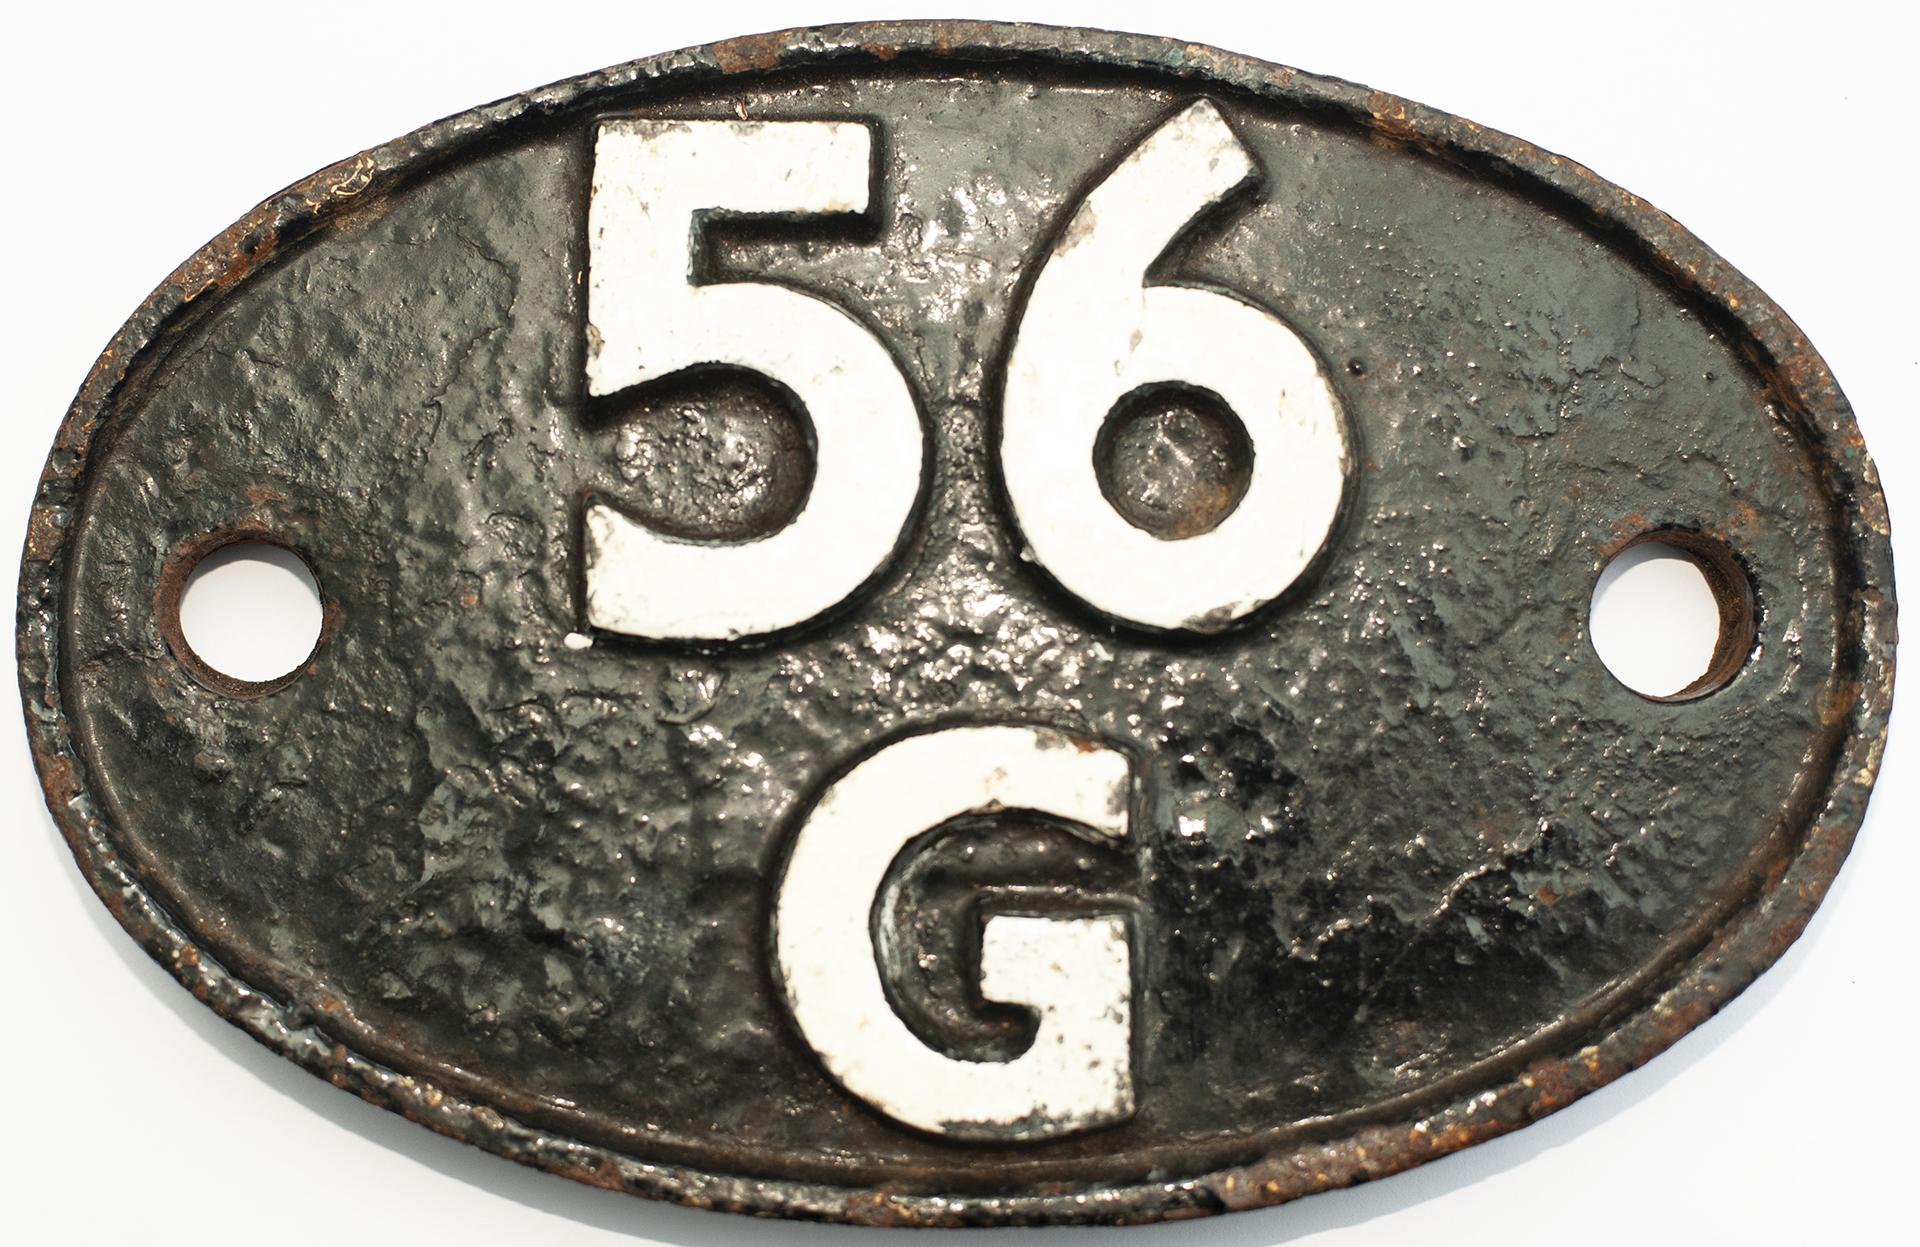 Shedplate 56g Bradford Hammerton Street 1956-1958.